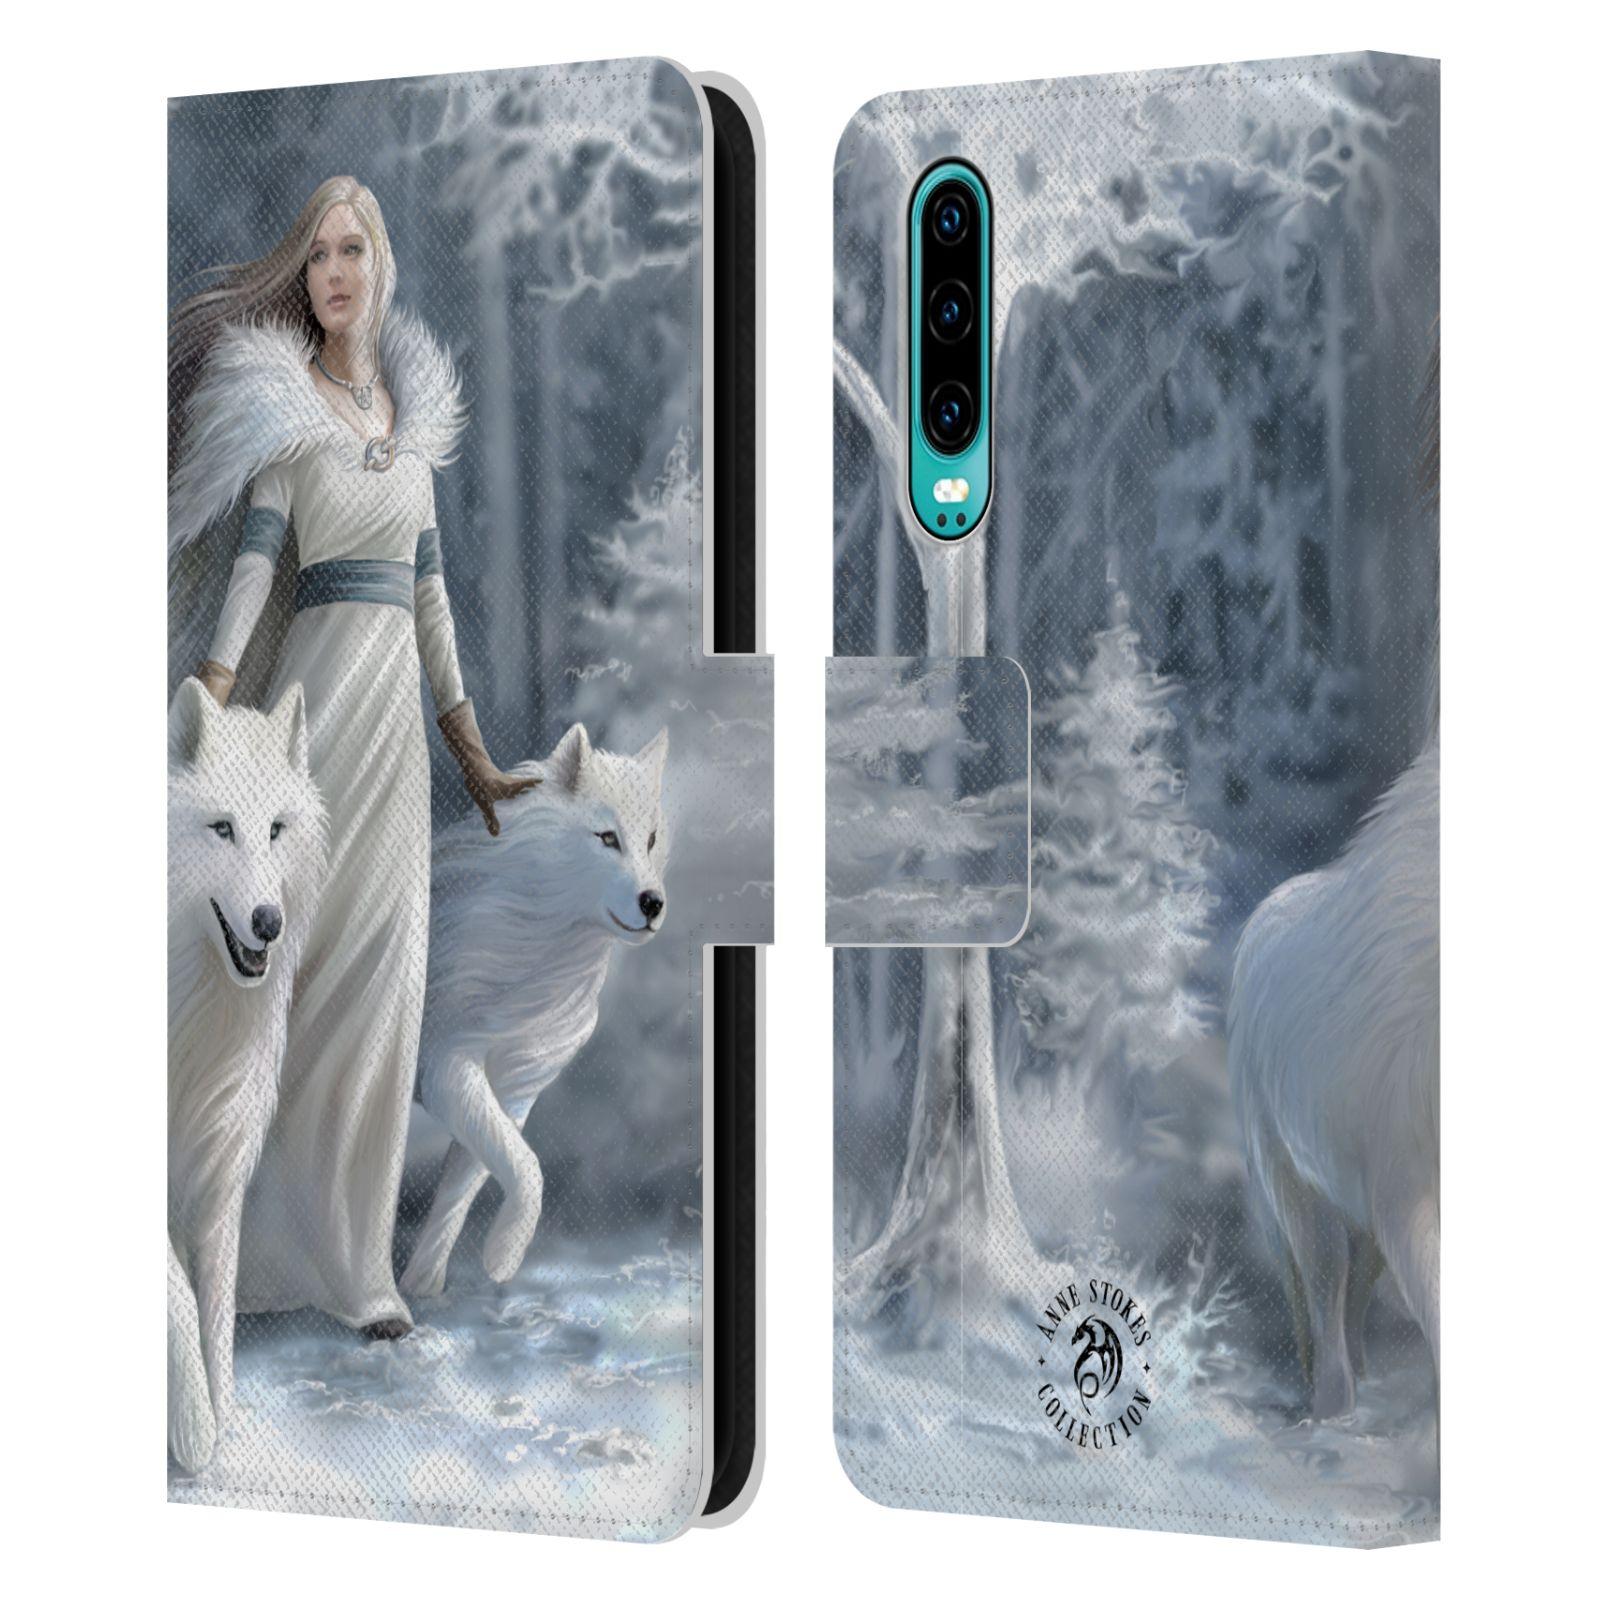 Pouzdro na mobil Huawei P30 - Head Case - fantasy - vlk zimní stráž